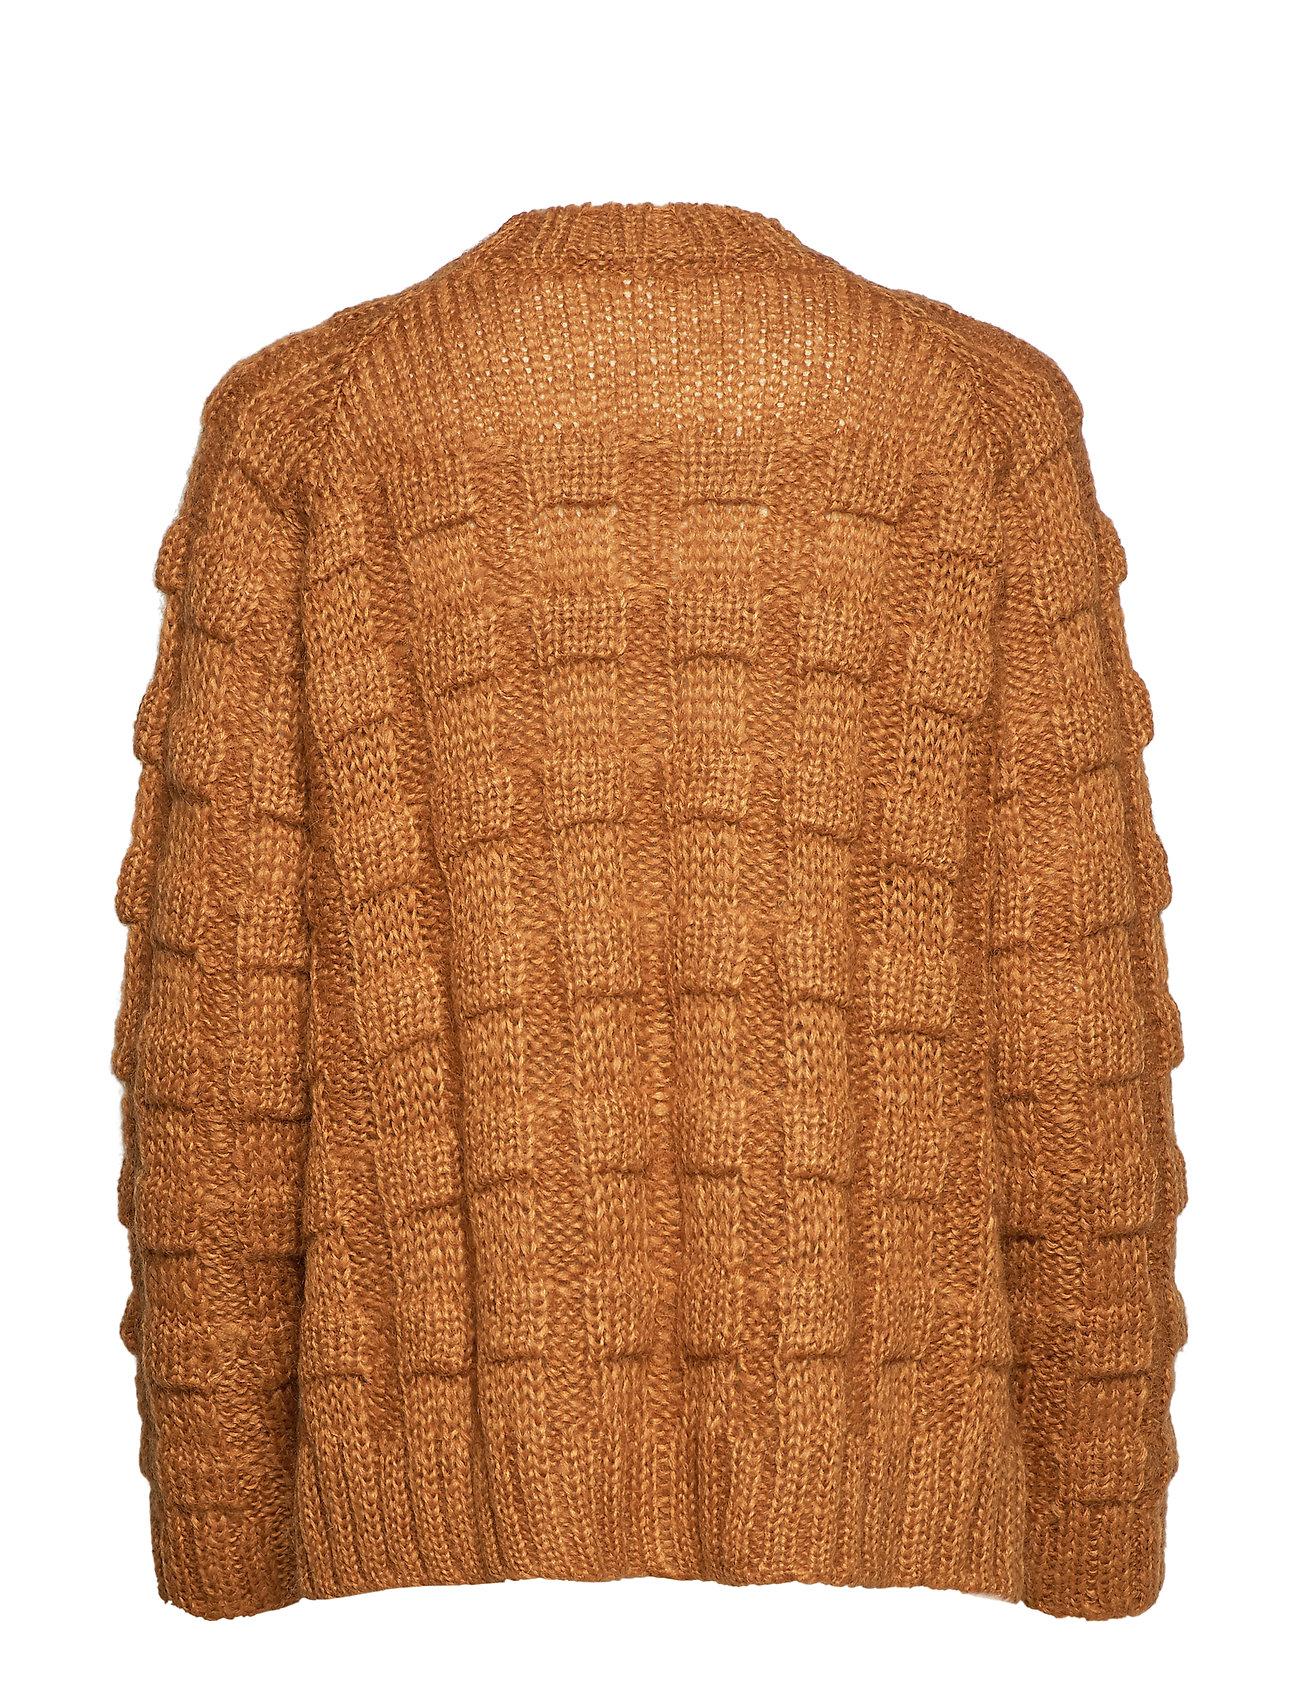 Boxy Croc Saloner SweatercaramelRabens Knit trshQdxC